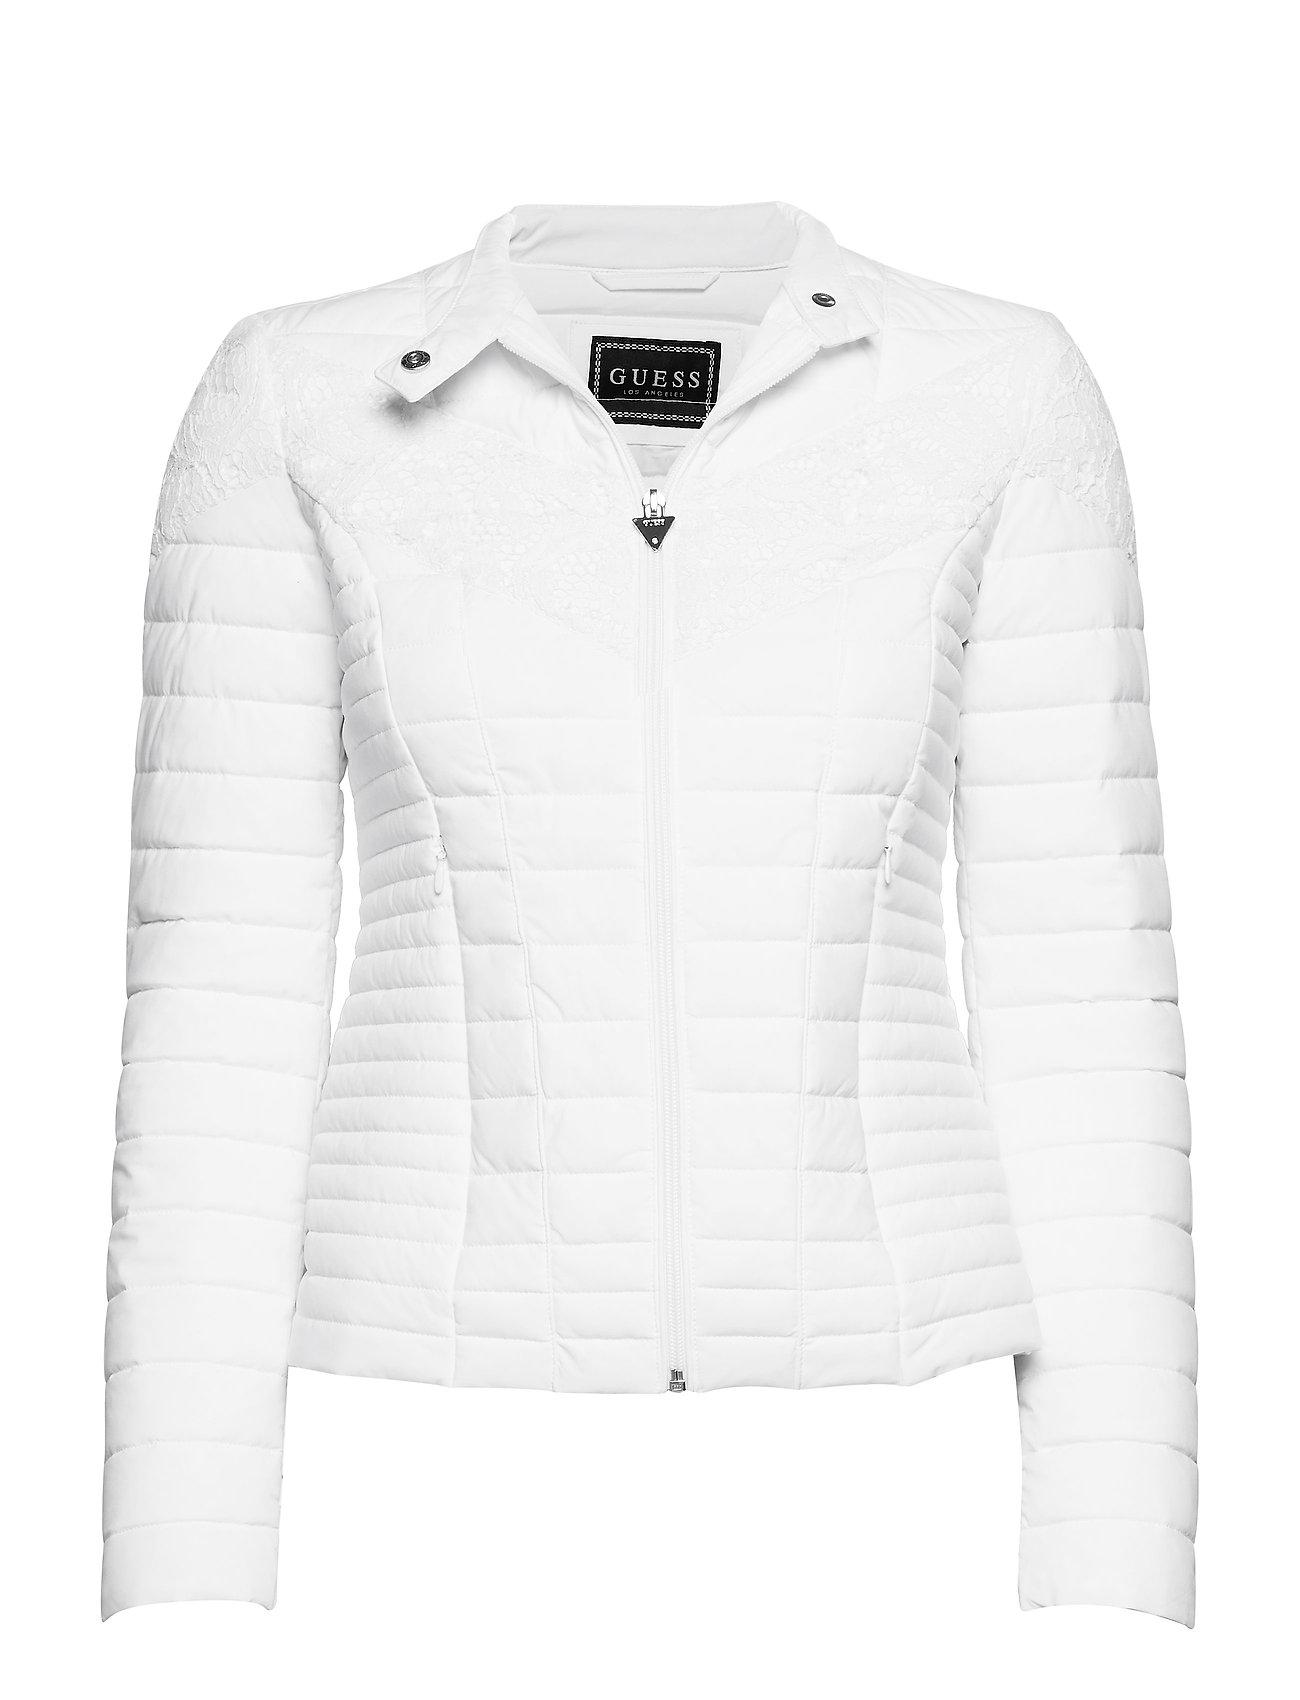 GUESS Vona Jacket Gefütterte Jacke Weiß GUESS JEANS